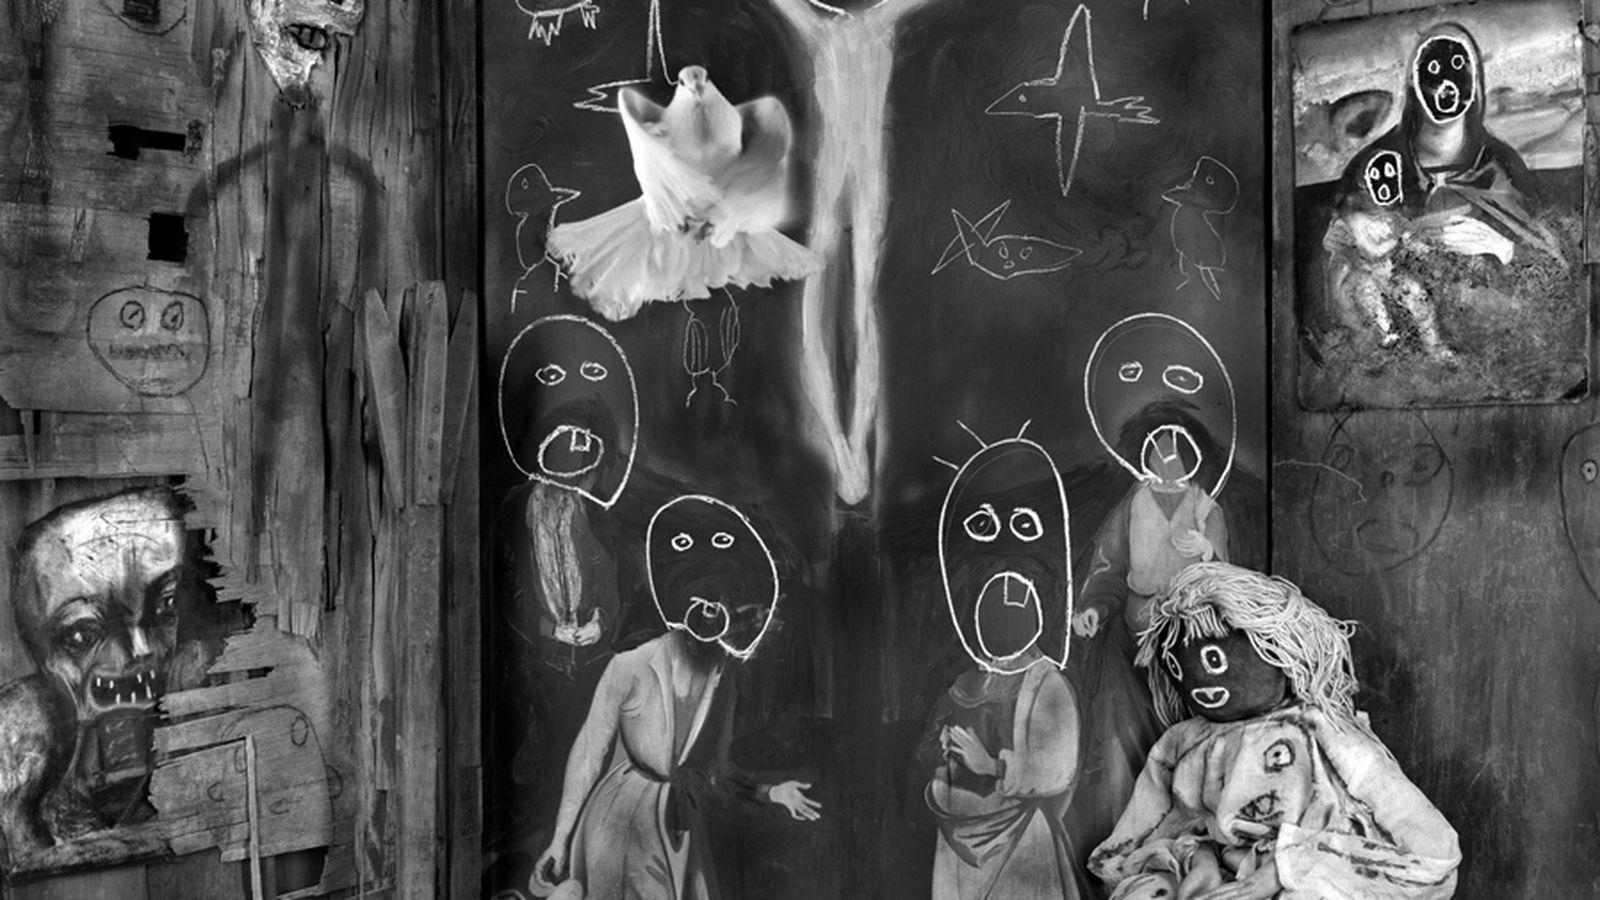 Encerró ArteEl En Fotógrafo Que Un Manicomio A Beckett Samuel OPkuwZXilT